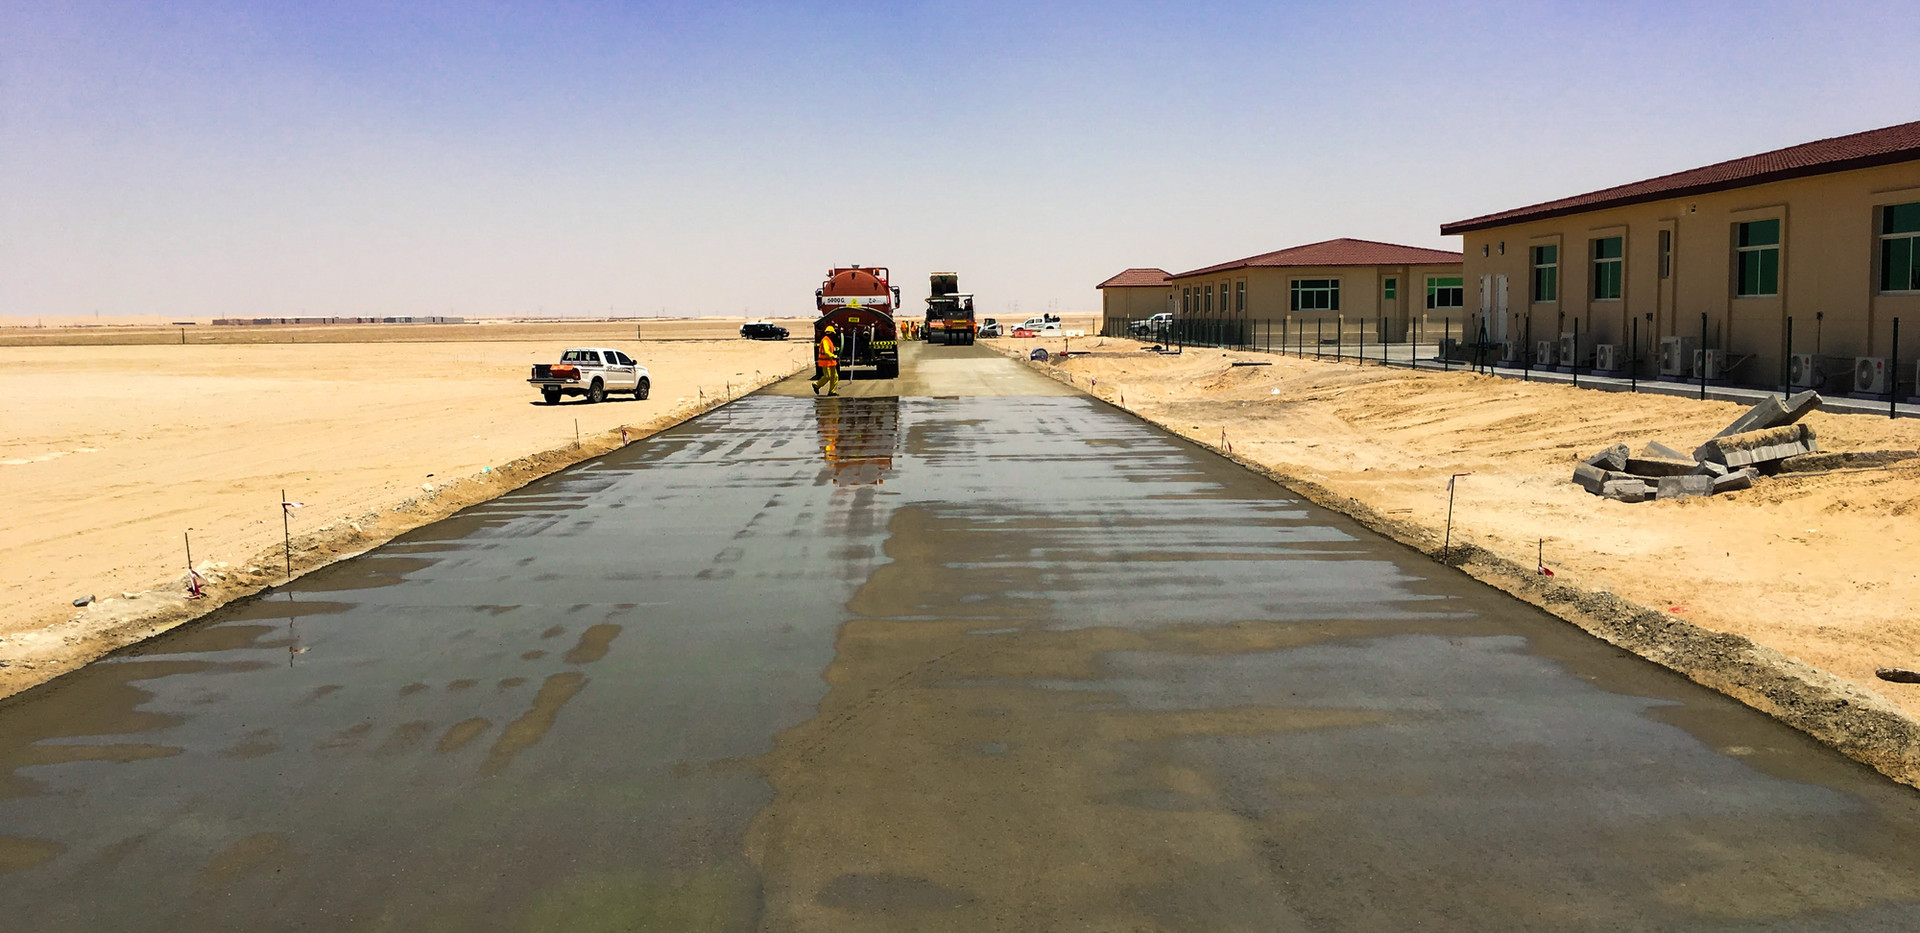 RCC Charcoal Factory Au Dhabi